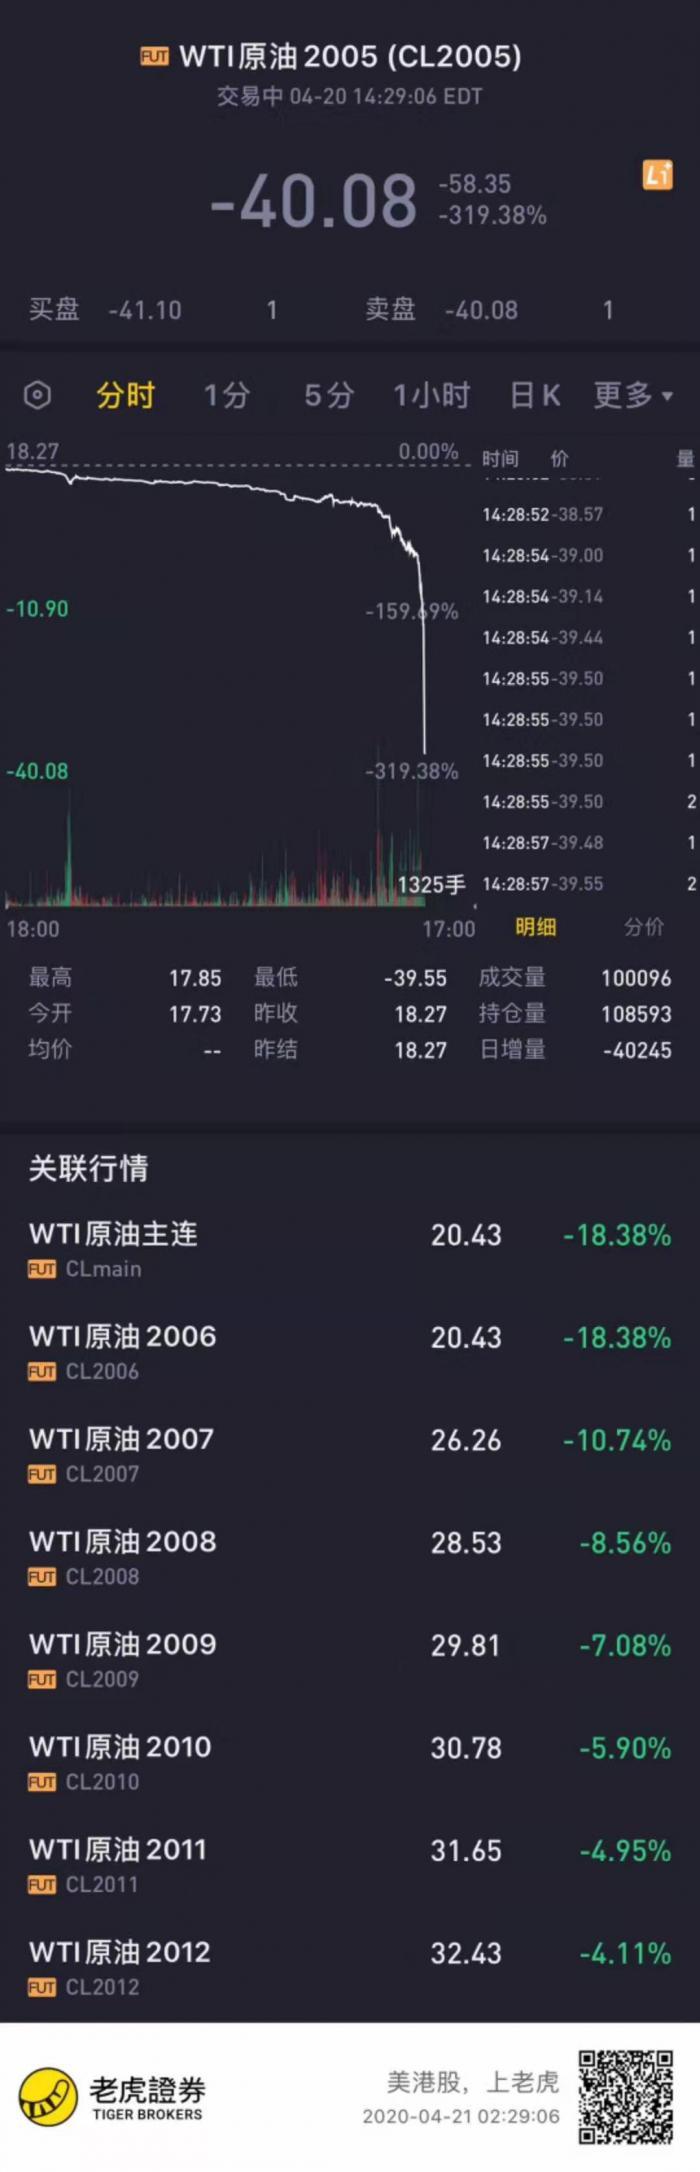 (WTI原油盘中跌逾320%)